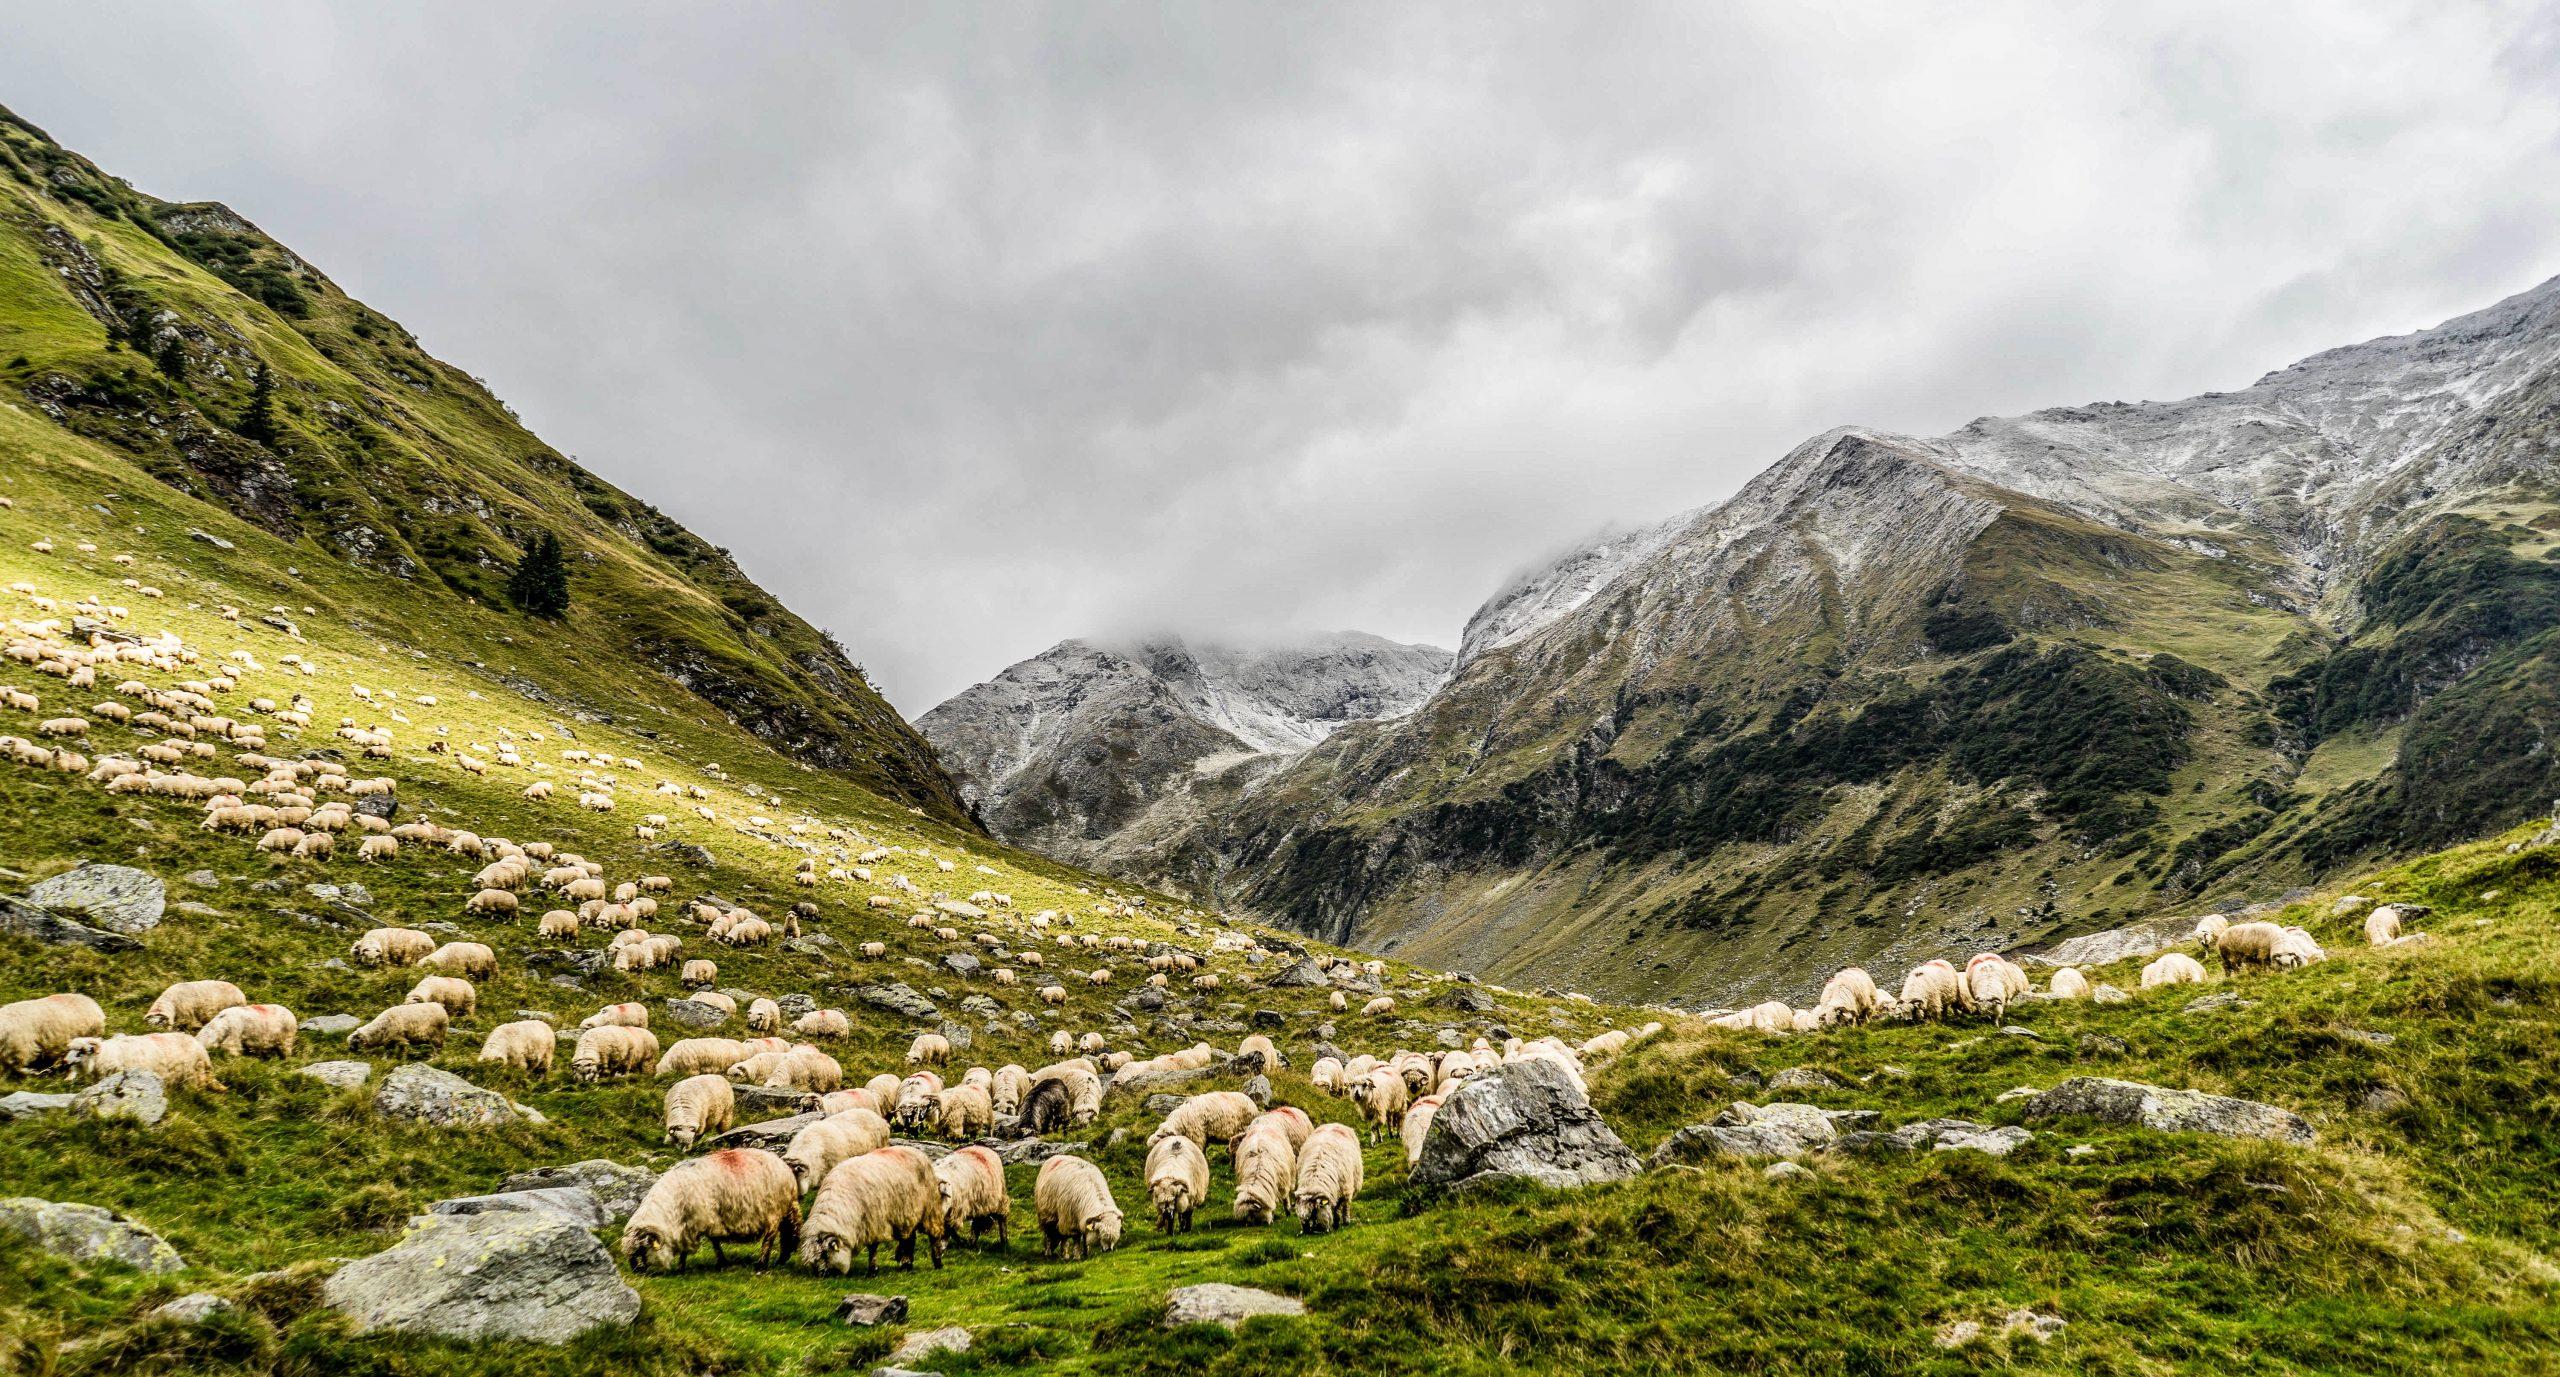 Sheep, Ravens, and Donkeys